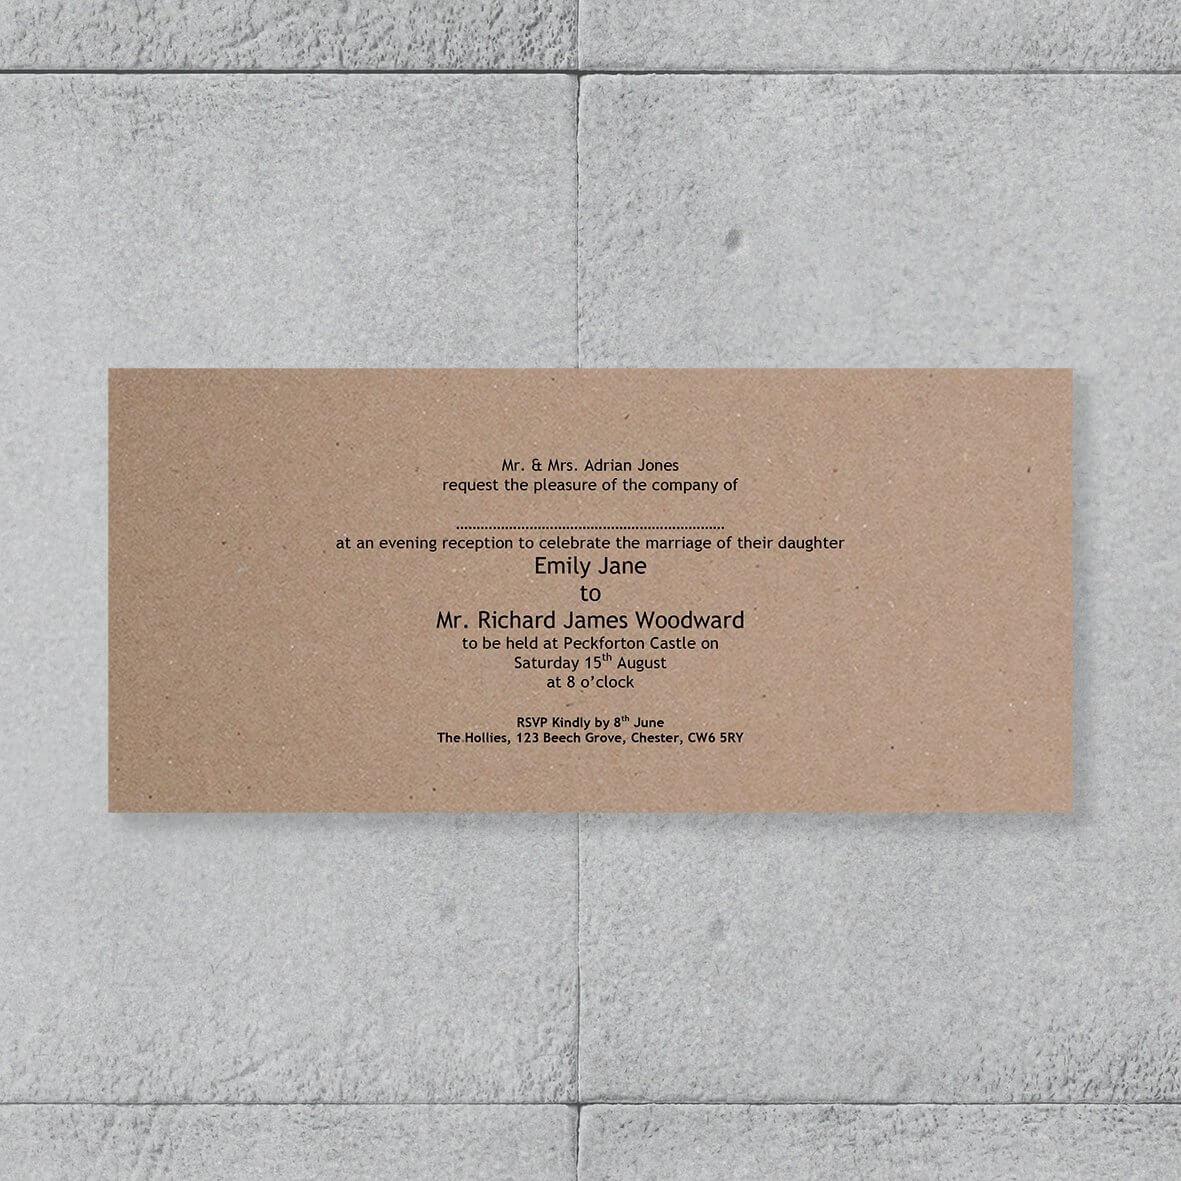 Enfolio Pocketfold (DL) - Cardmount and Cardstep 1 - Evening Invitation Template